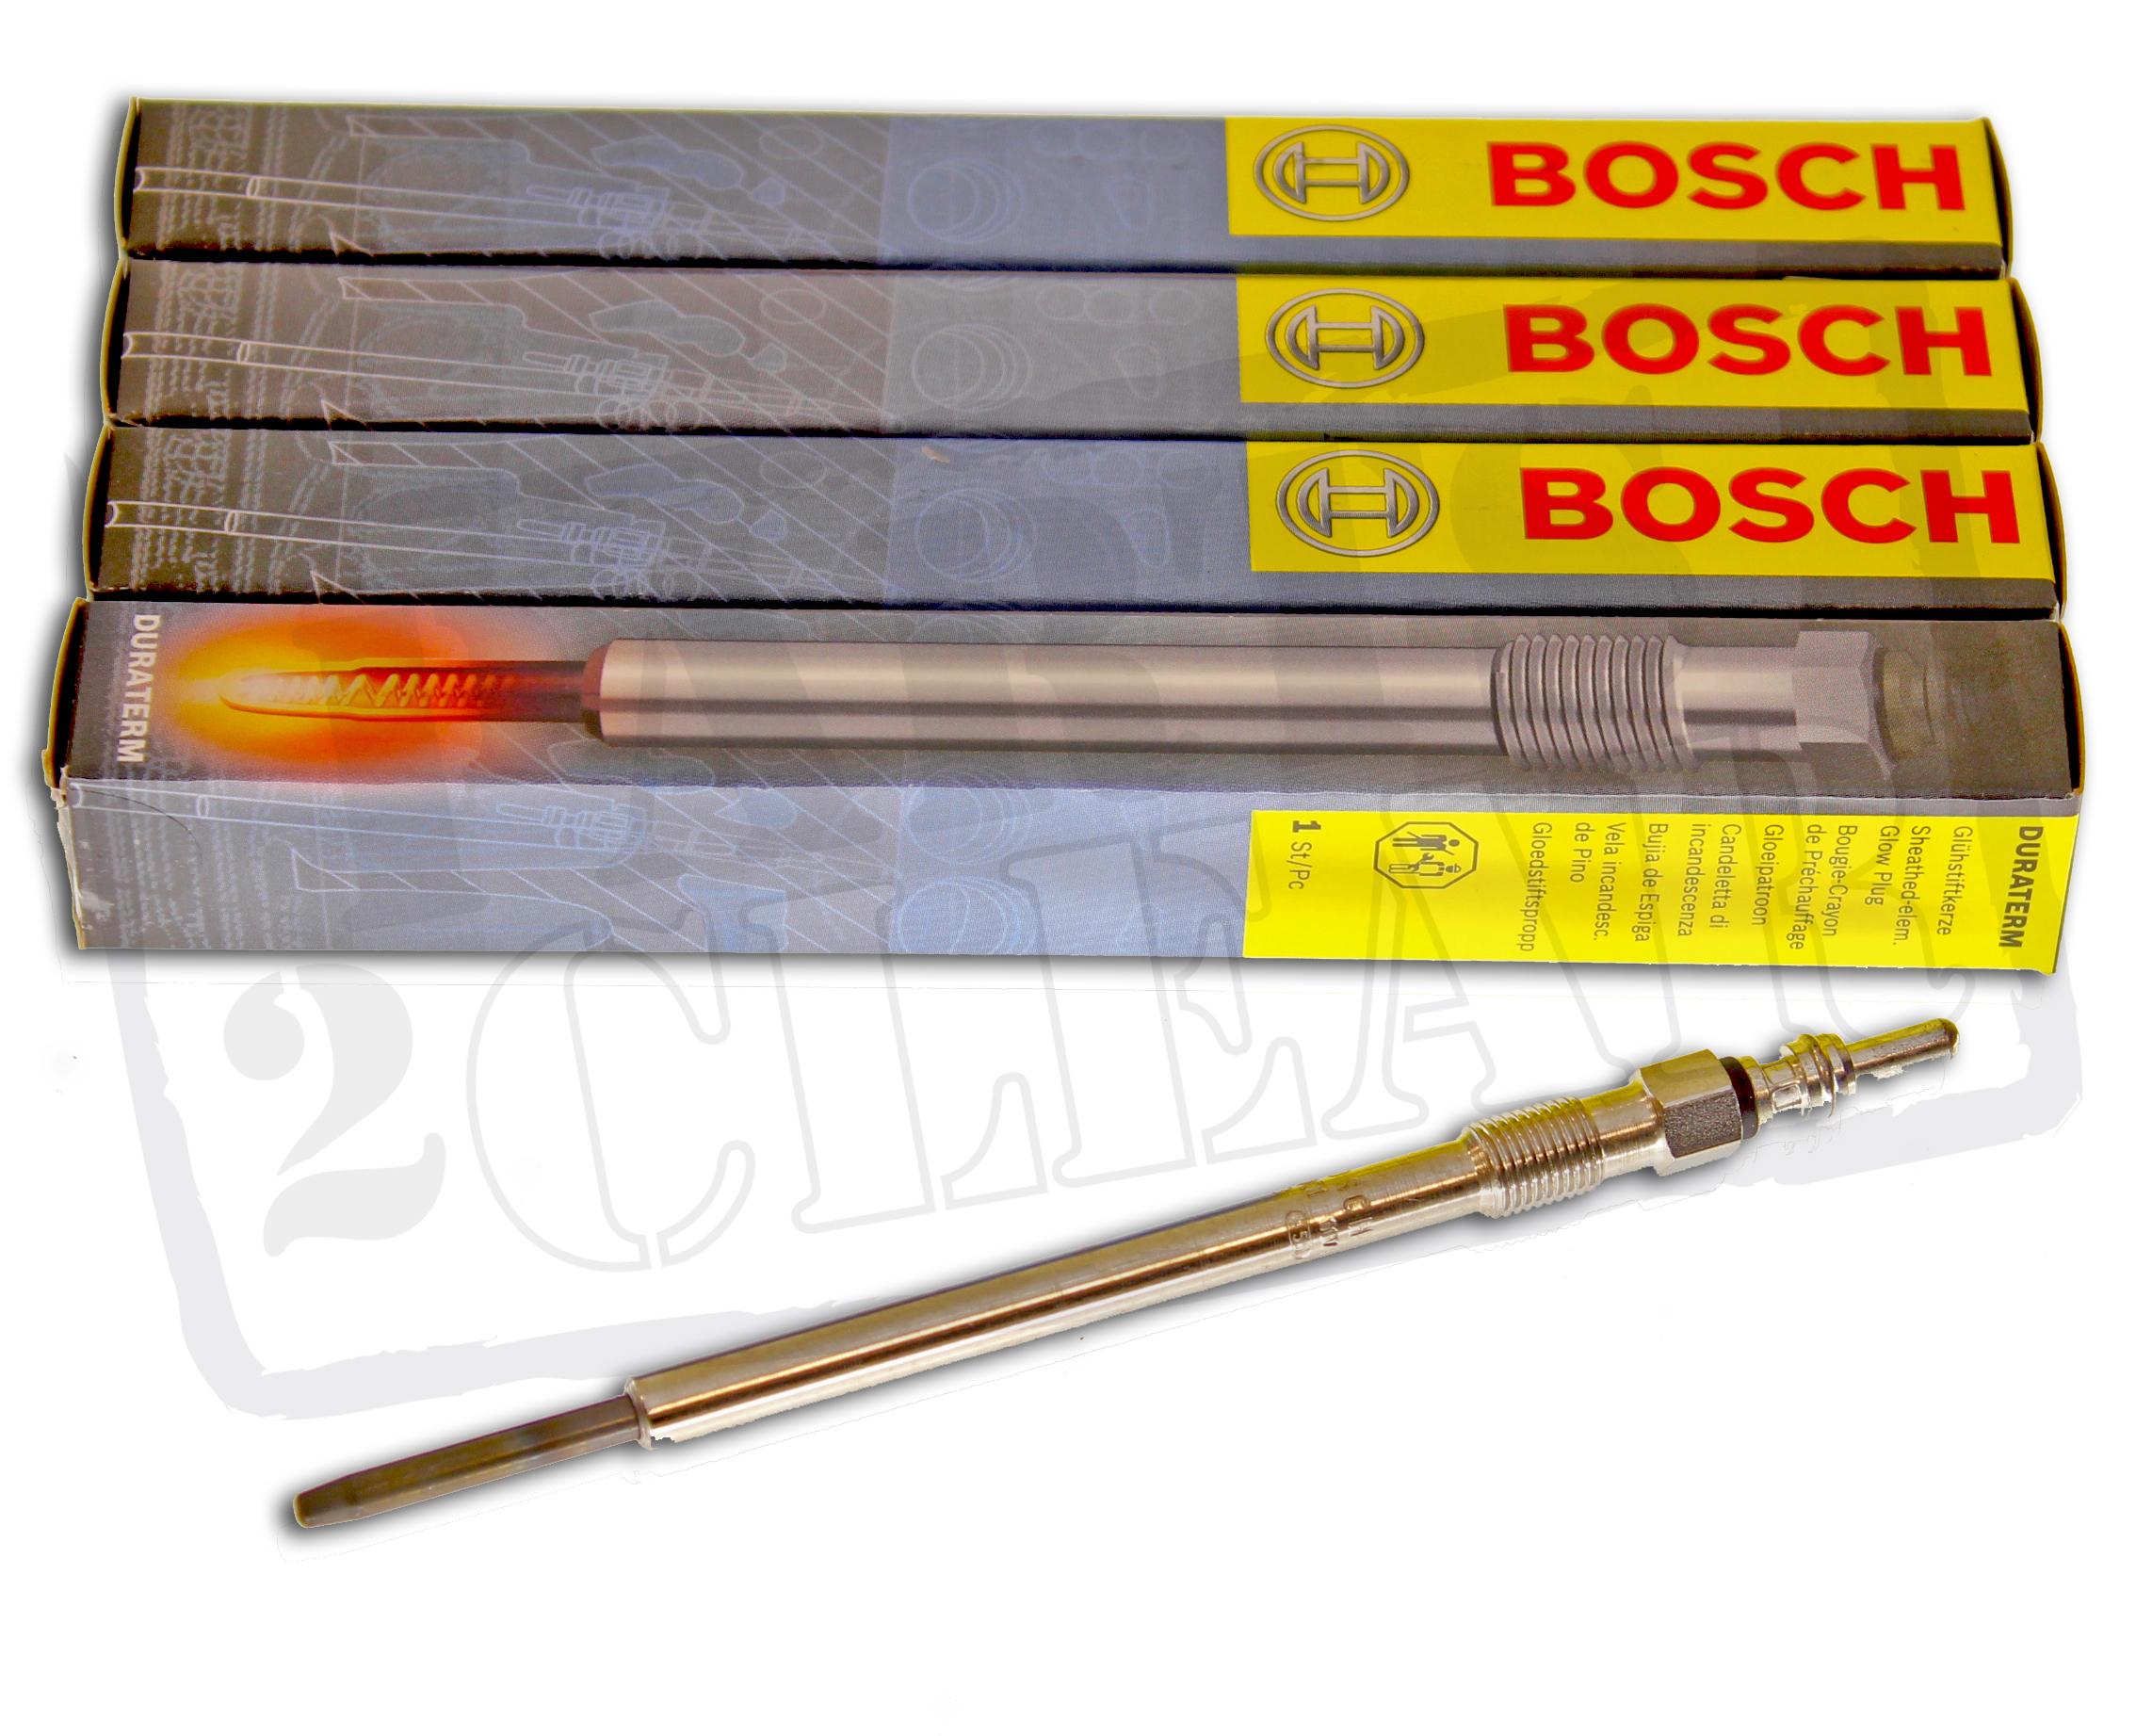 Vauxhall Movano 23 Cdti Bosch Diesel Glow Plug X 4 Kit Set 10 Controller Wiring Harness 0250603001